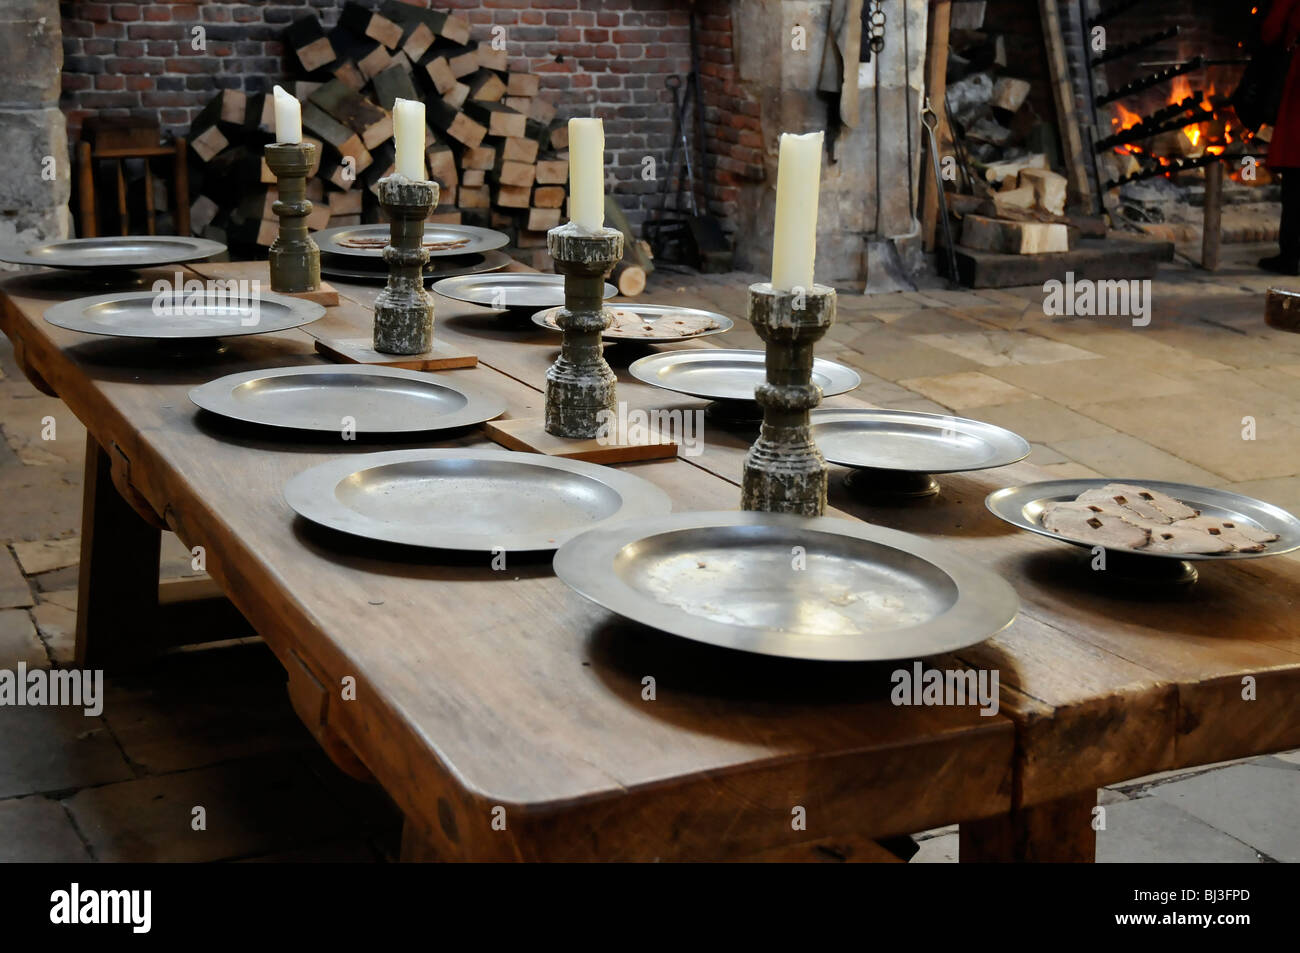 Hampton Court Kitchen Table London Uk Stock Photo 28352421 Alamy # Table De Jardin Ludon